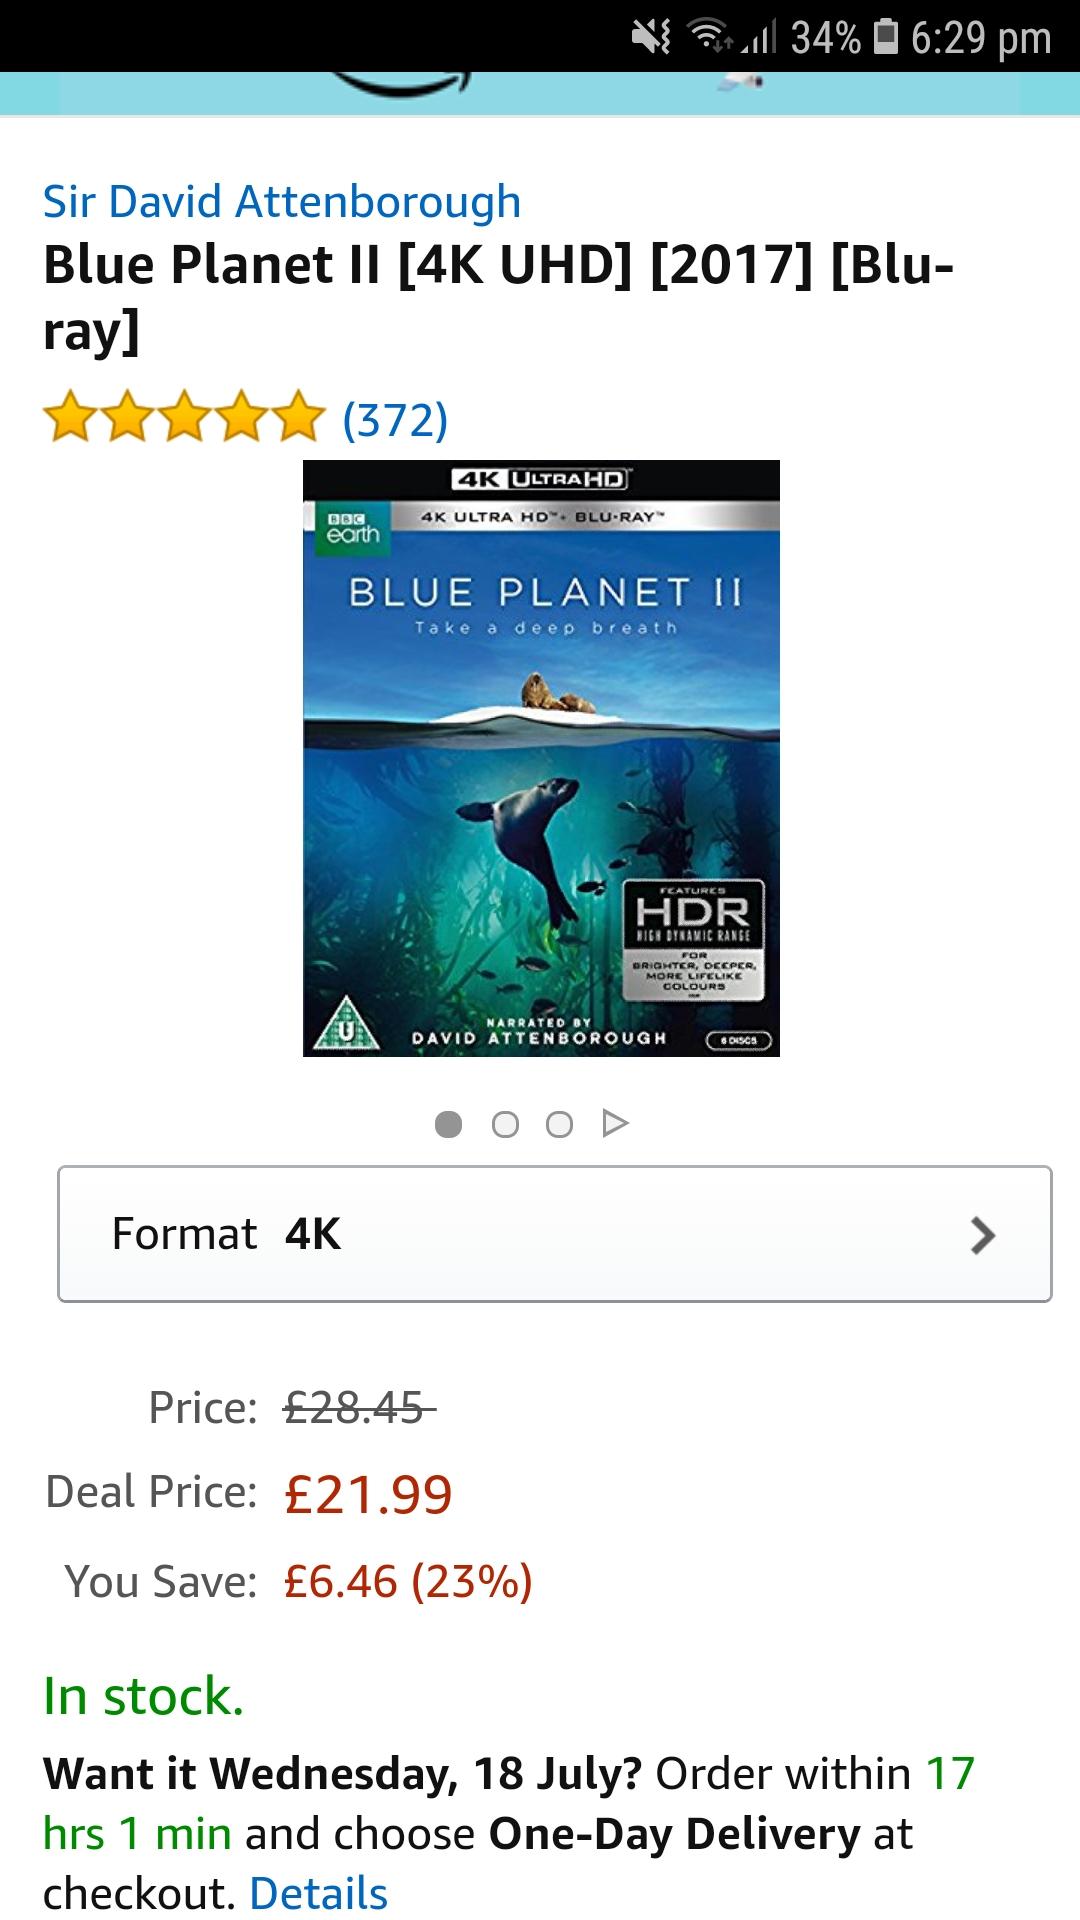 Blue planet 2 4k @ amazon prime day lightning deal. - £21.99